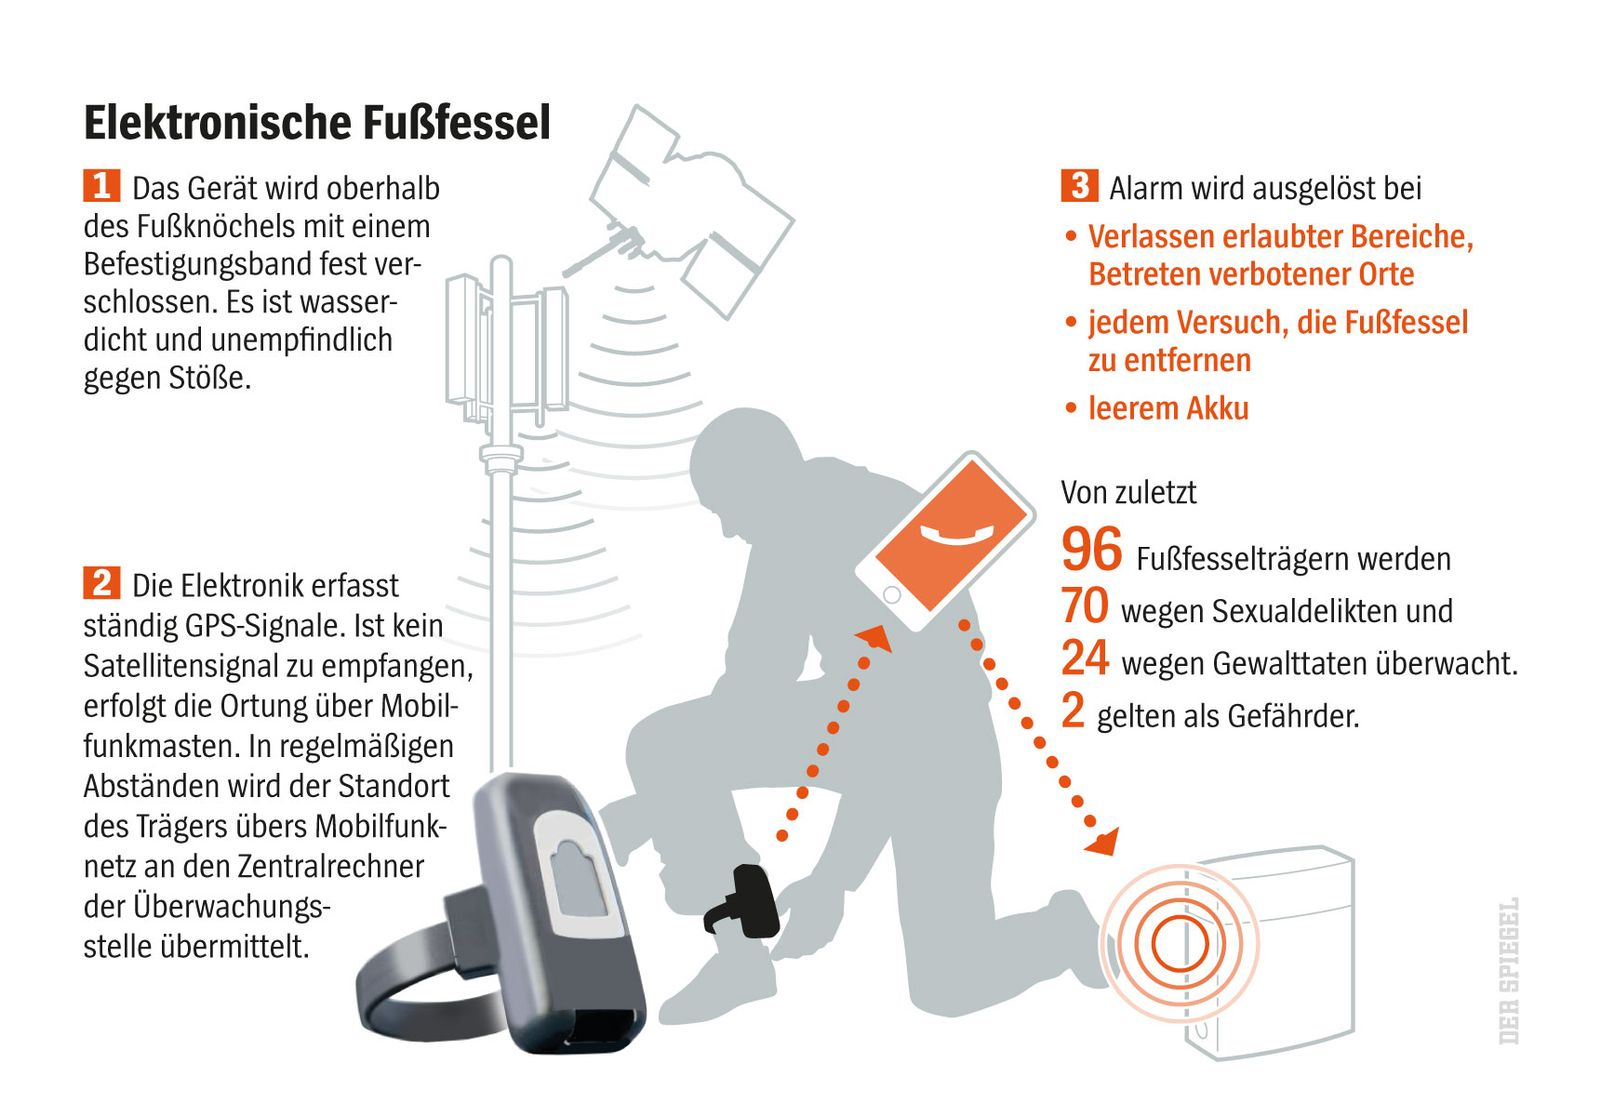 SPIEGEL Plus Fußfessel Islamist / Diehl